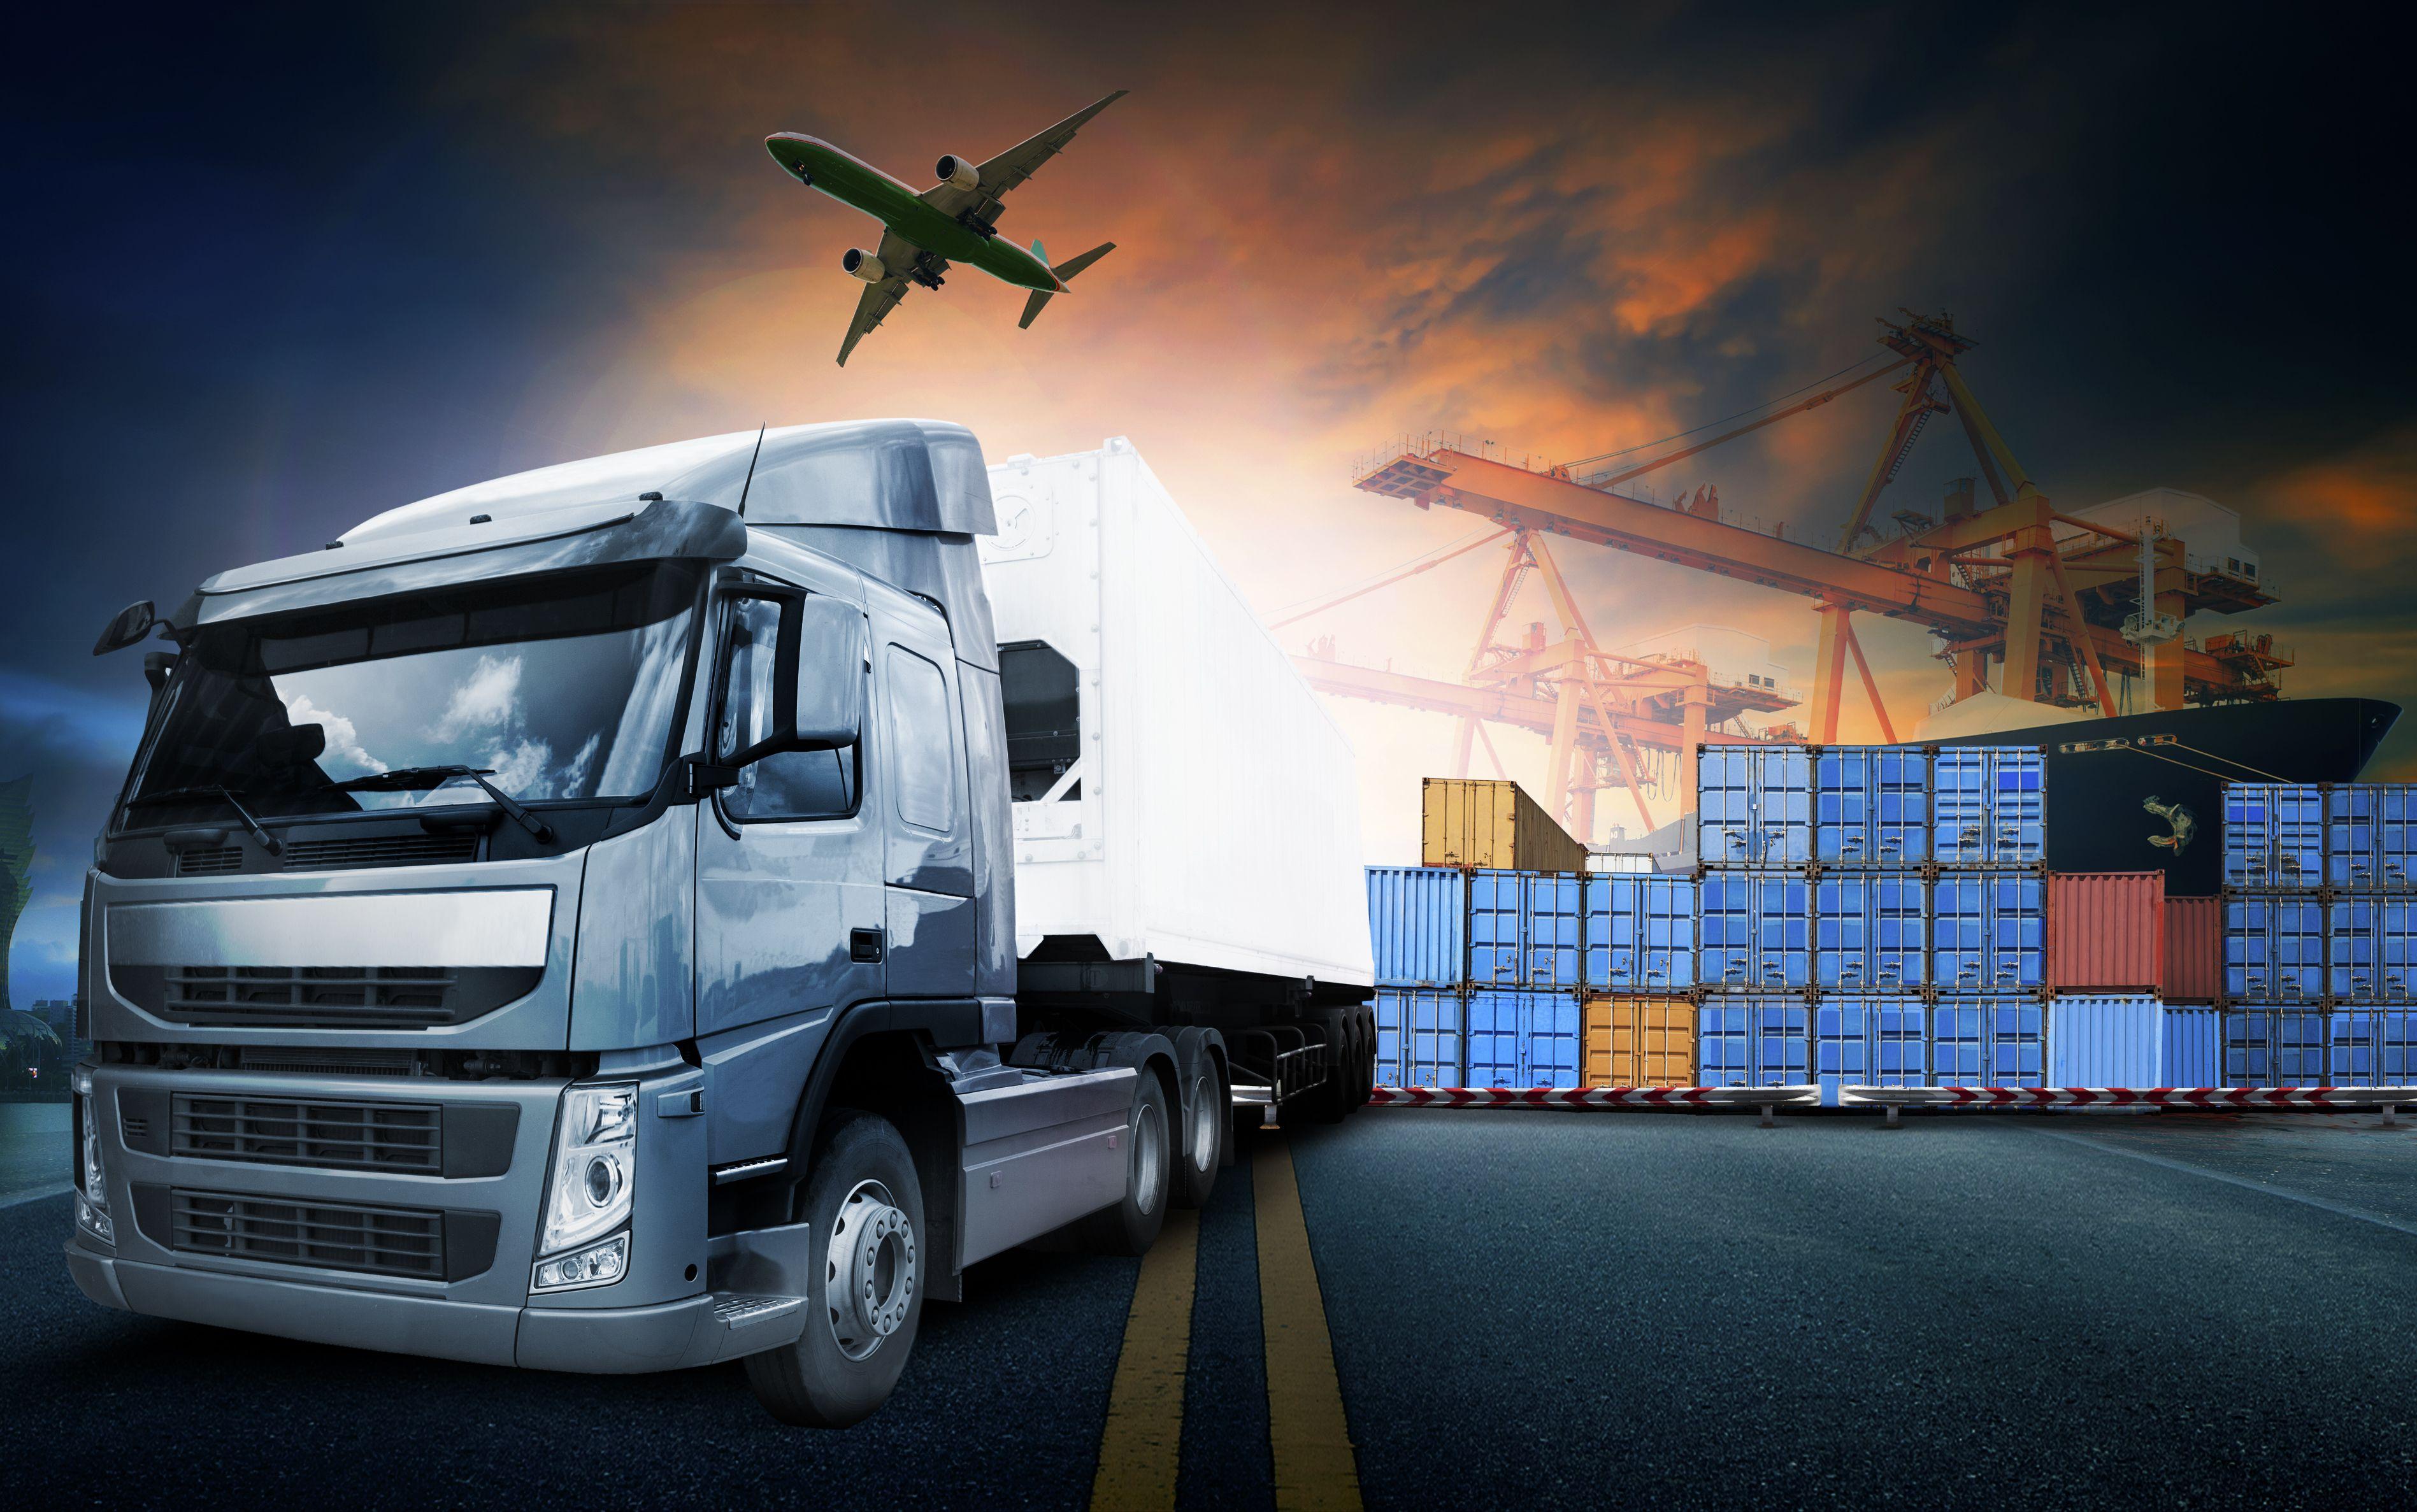 Transporte de contenedores marítimos: Servicios de Transportes Logística Marín